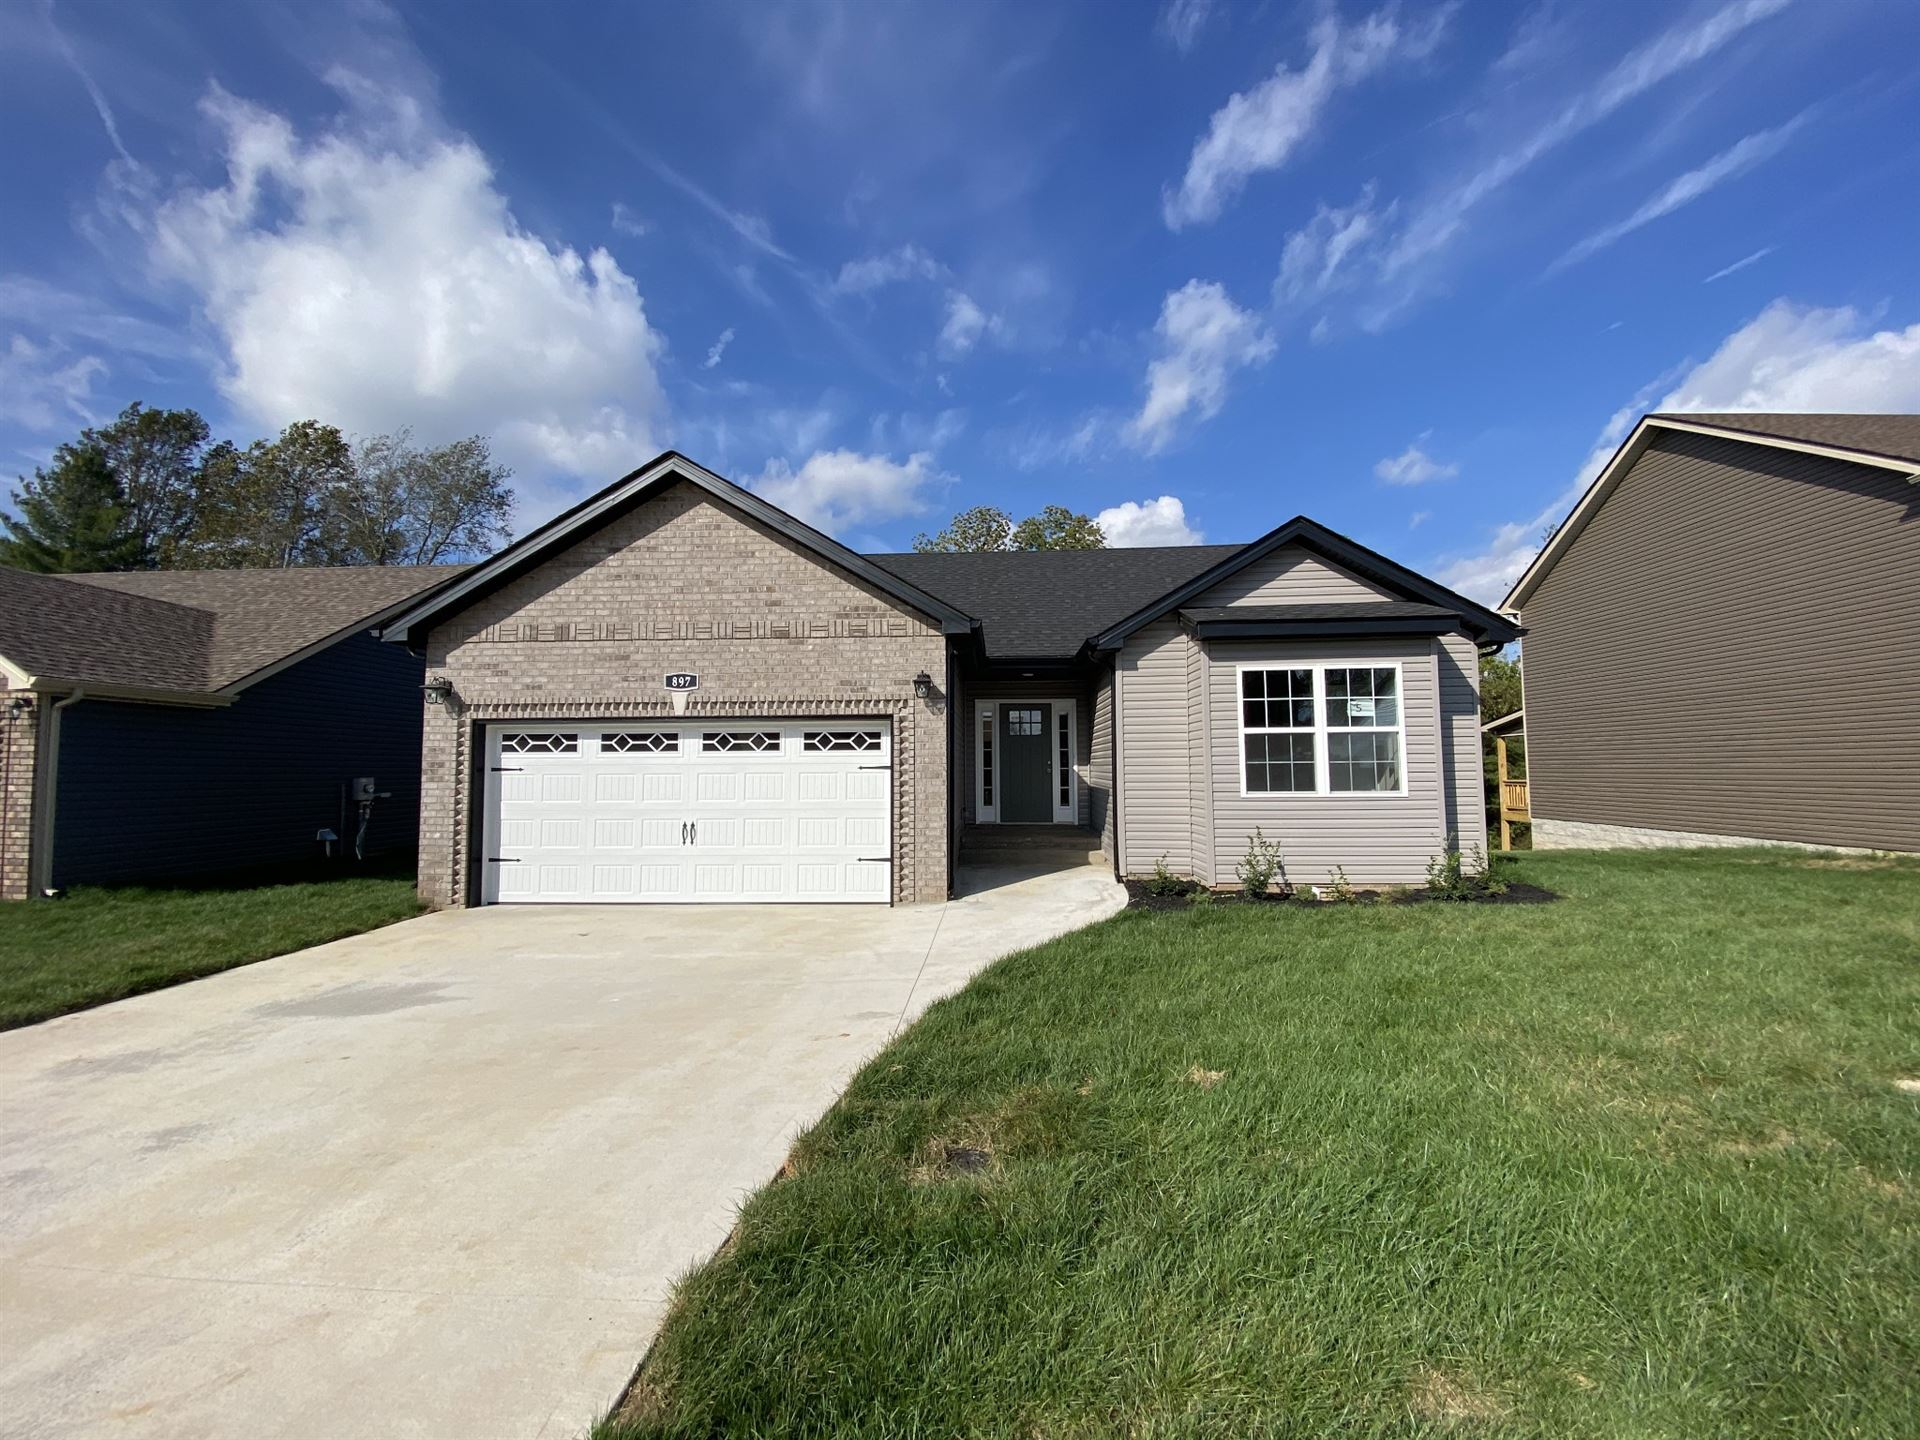 5 Irish Hills, Clarksville, TN 37042 - MLS#: 2264990